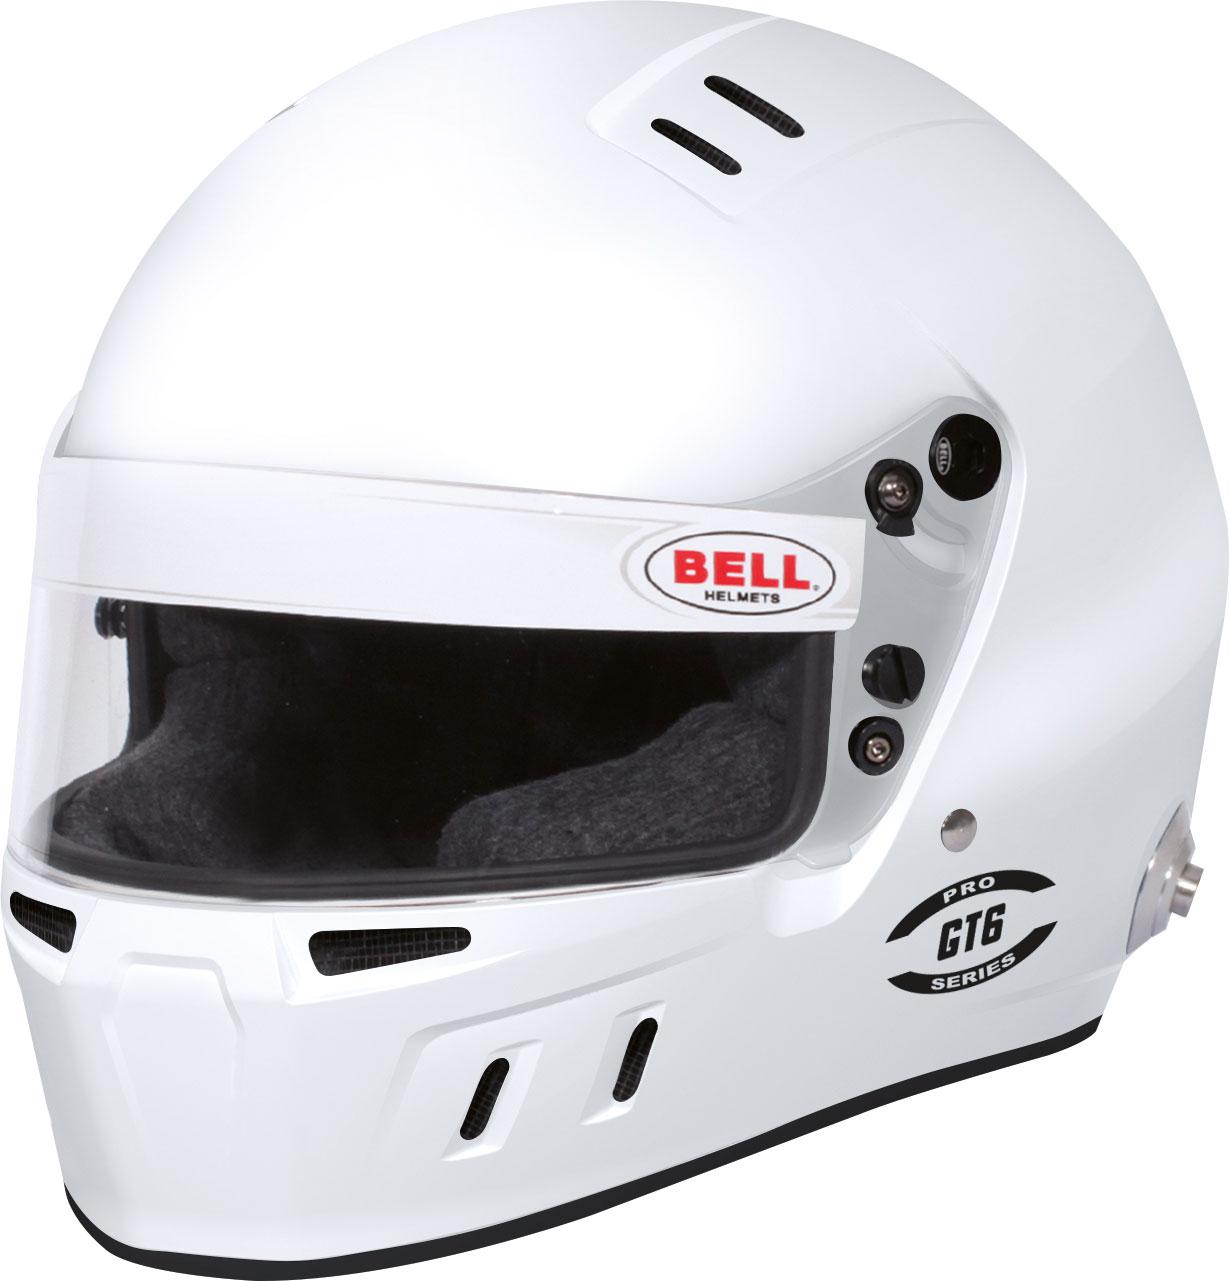 BELL Helm GT6 Pro